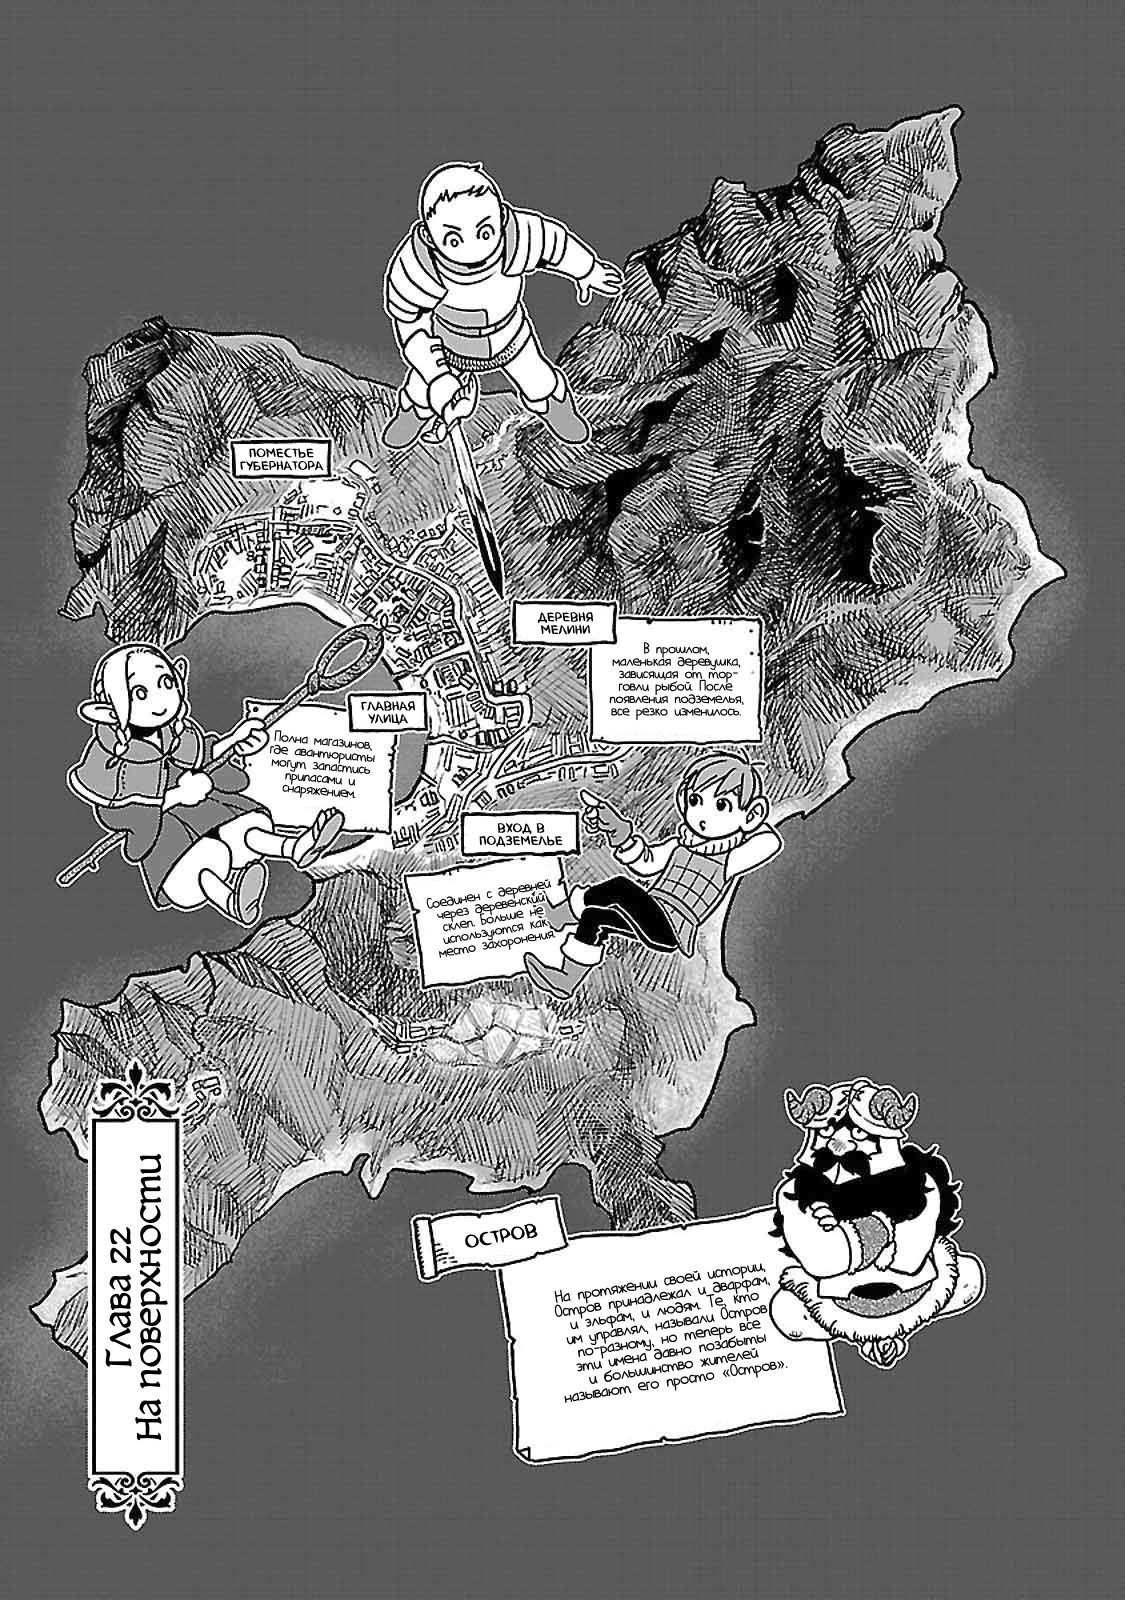 https://r1.ninemanga.com/comics/pic2/50/27634/1121980/1540509648116.jpg Page 1